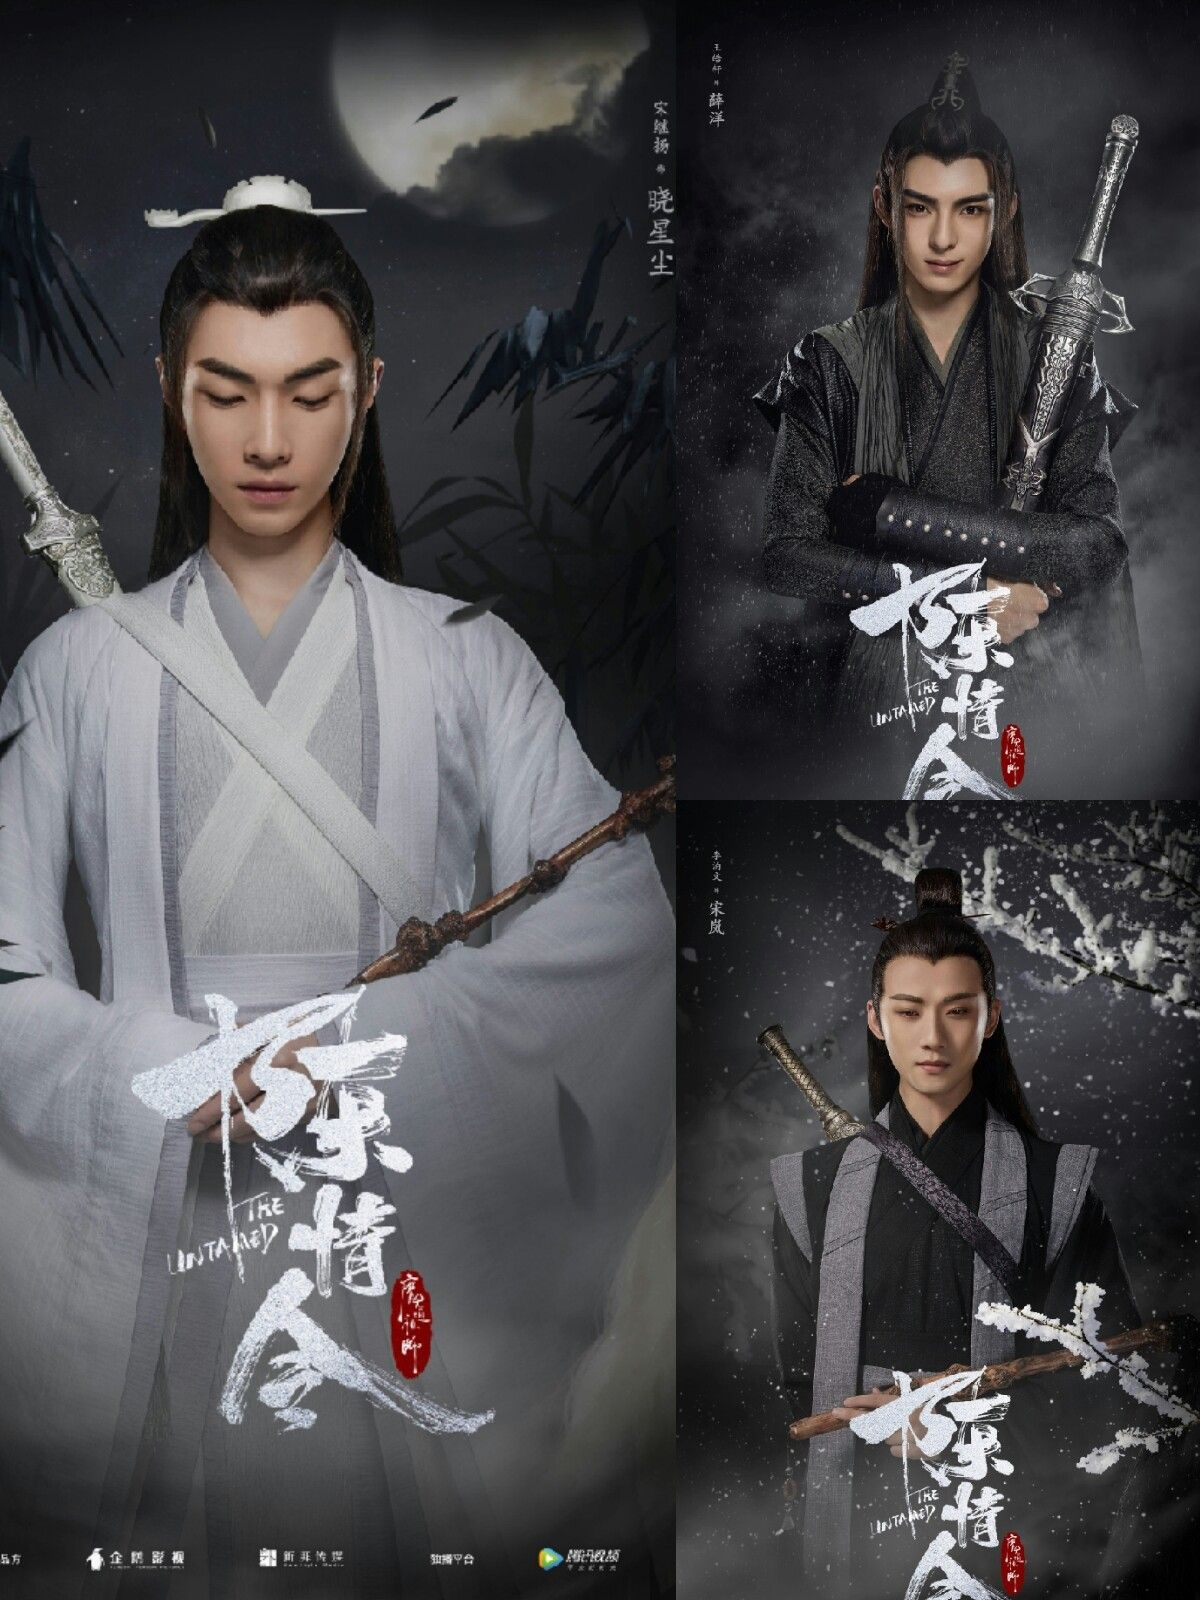 Ghim của Sammee trên fantastical hanfu\Chinese manhua